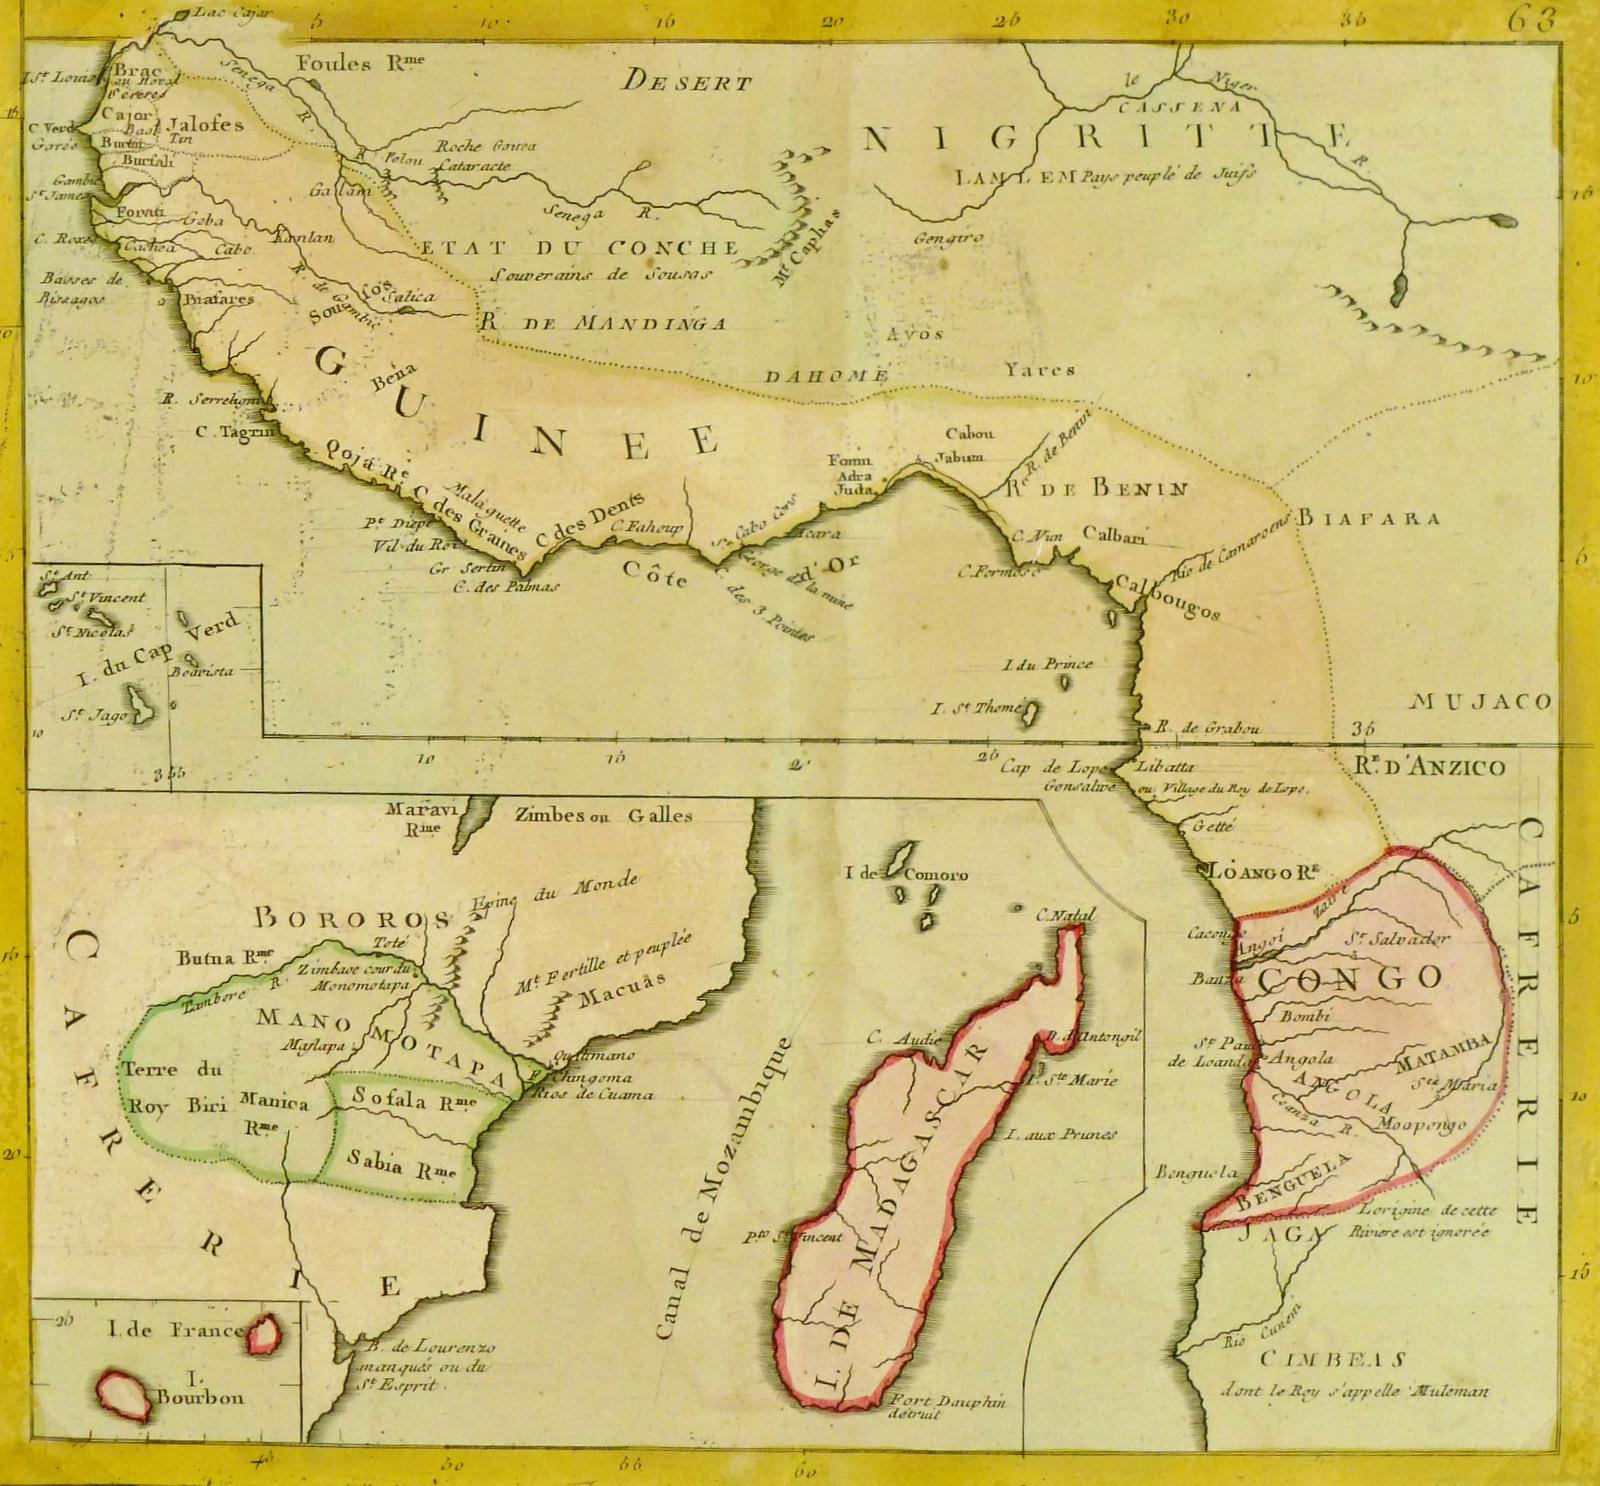 Map - Africa, 1767-main-8121K